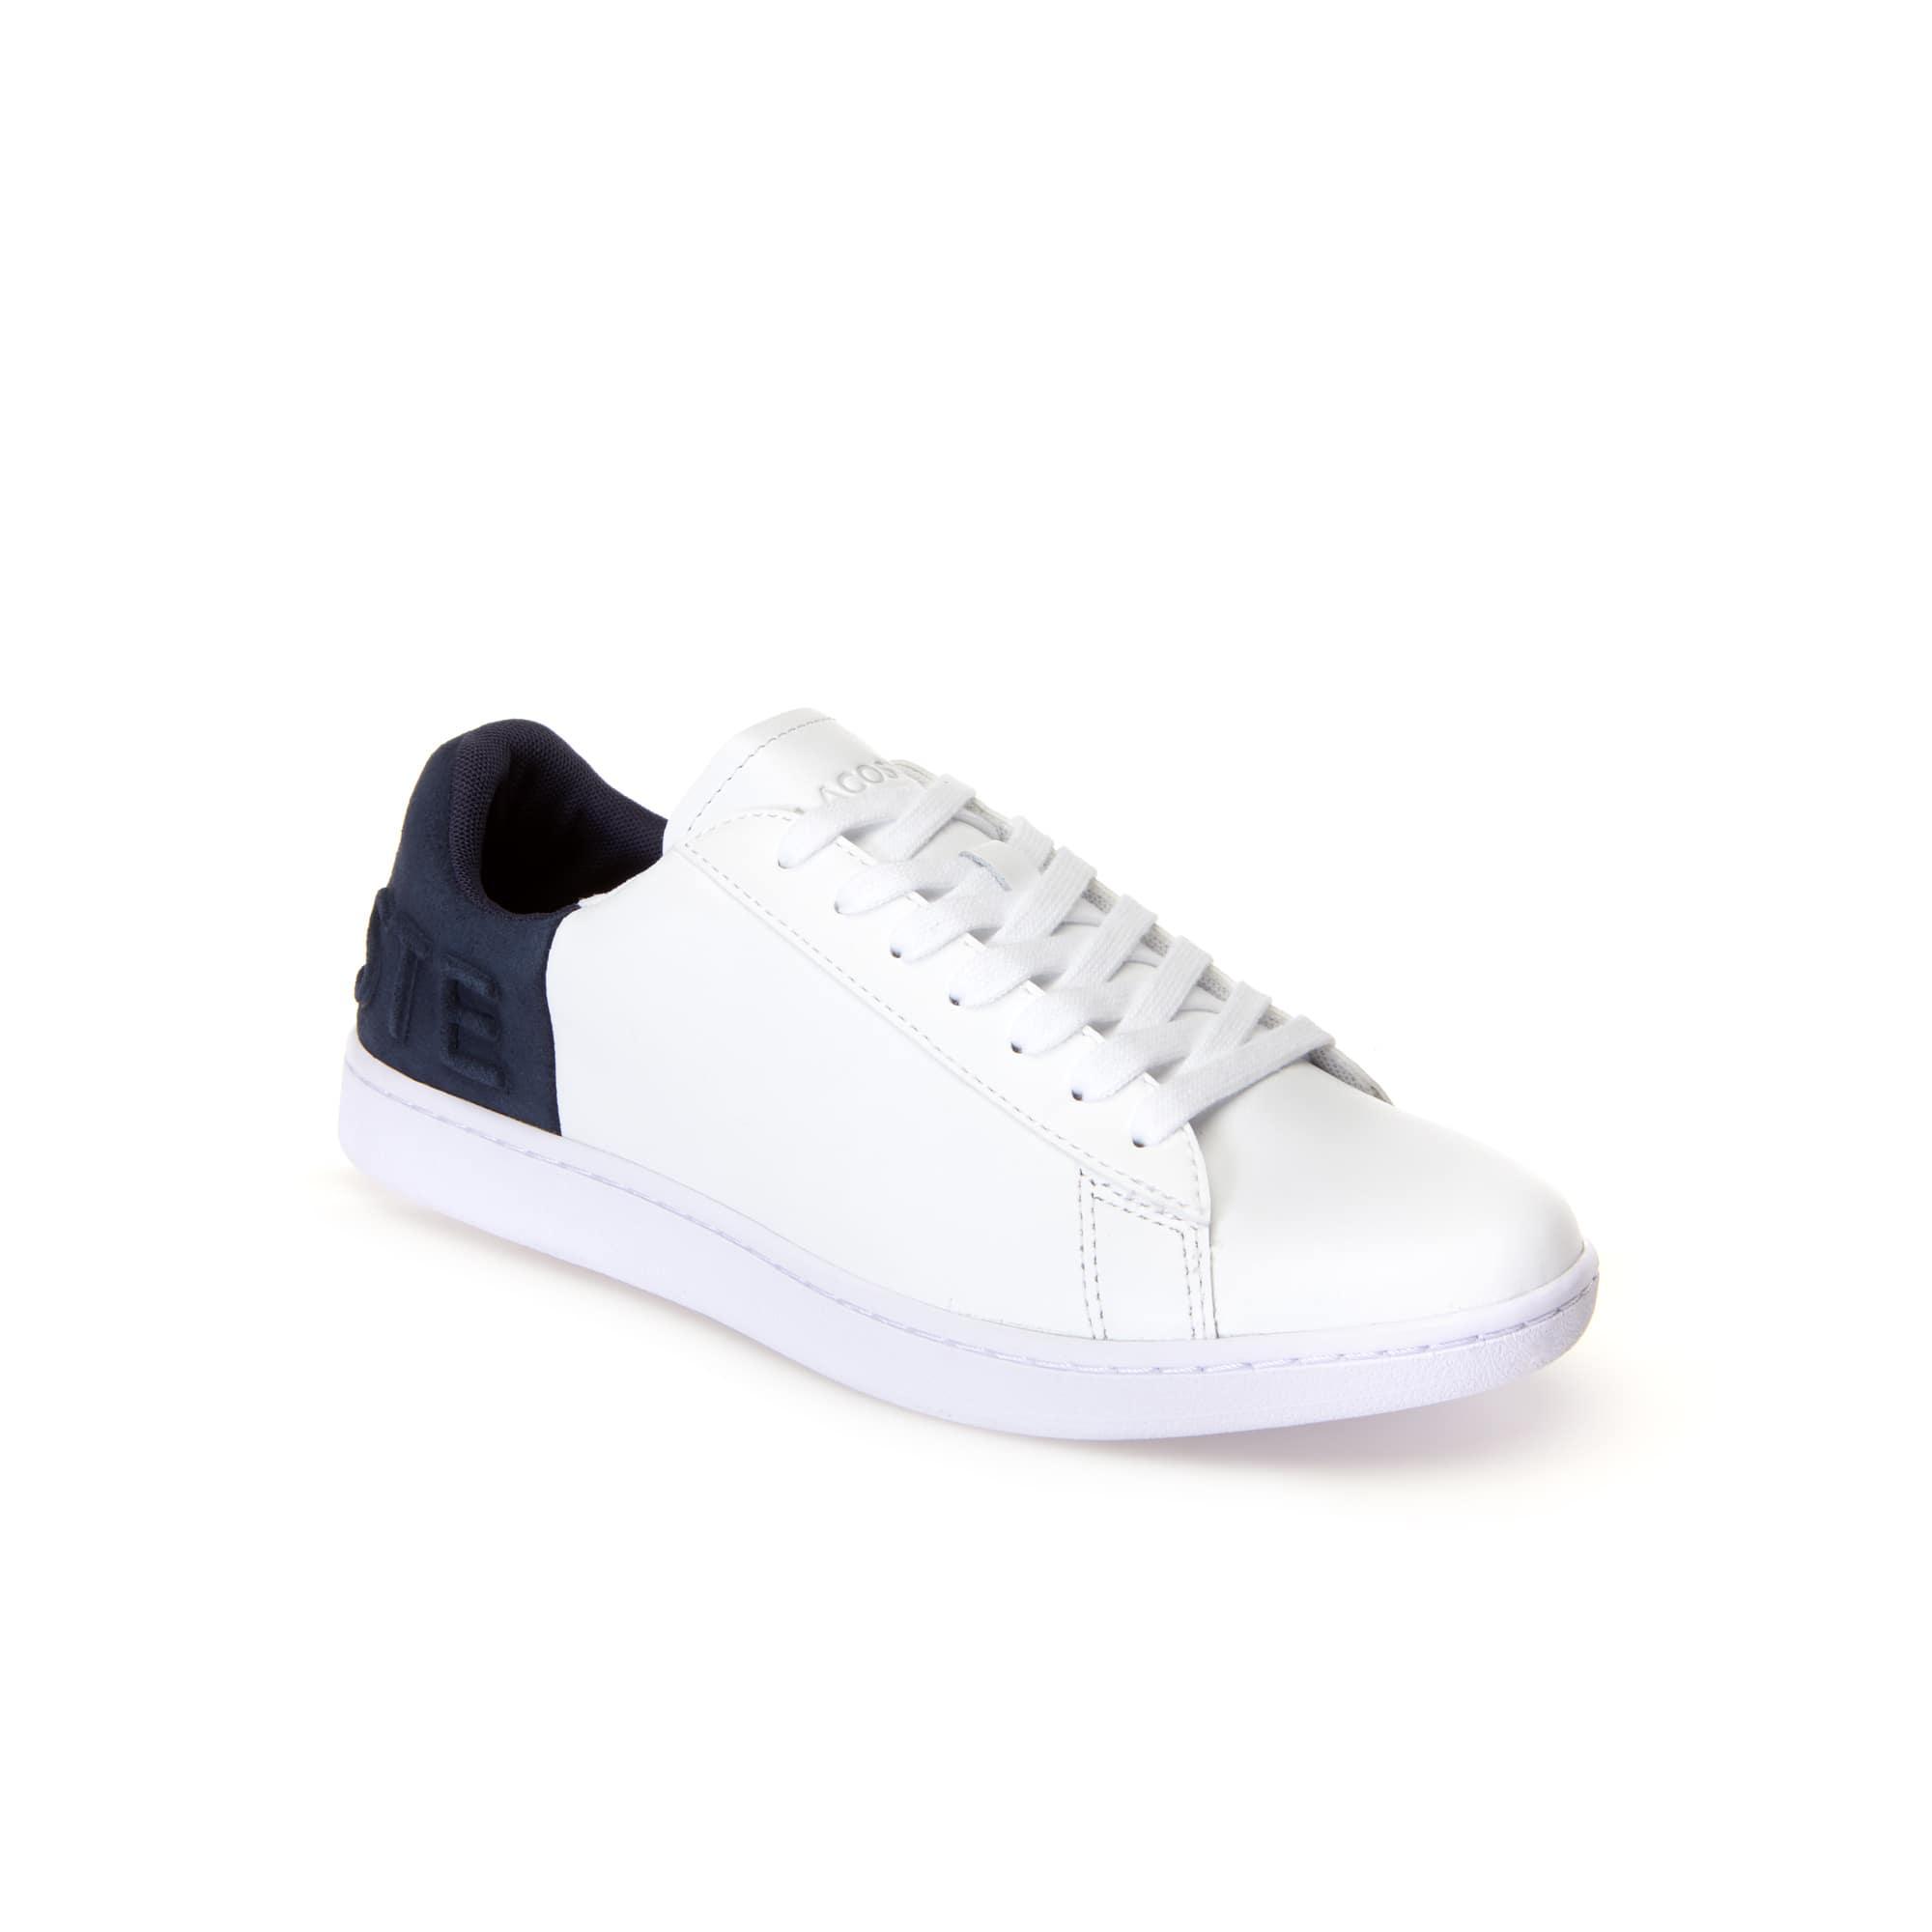 Damen-Sneakers CARNABY EVO aus Leder mit Colorblocks